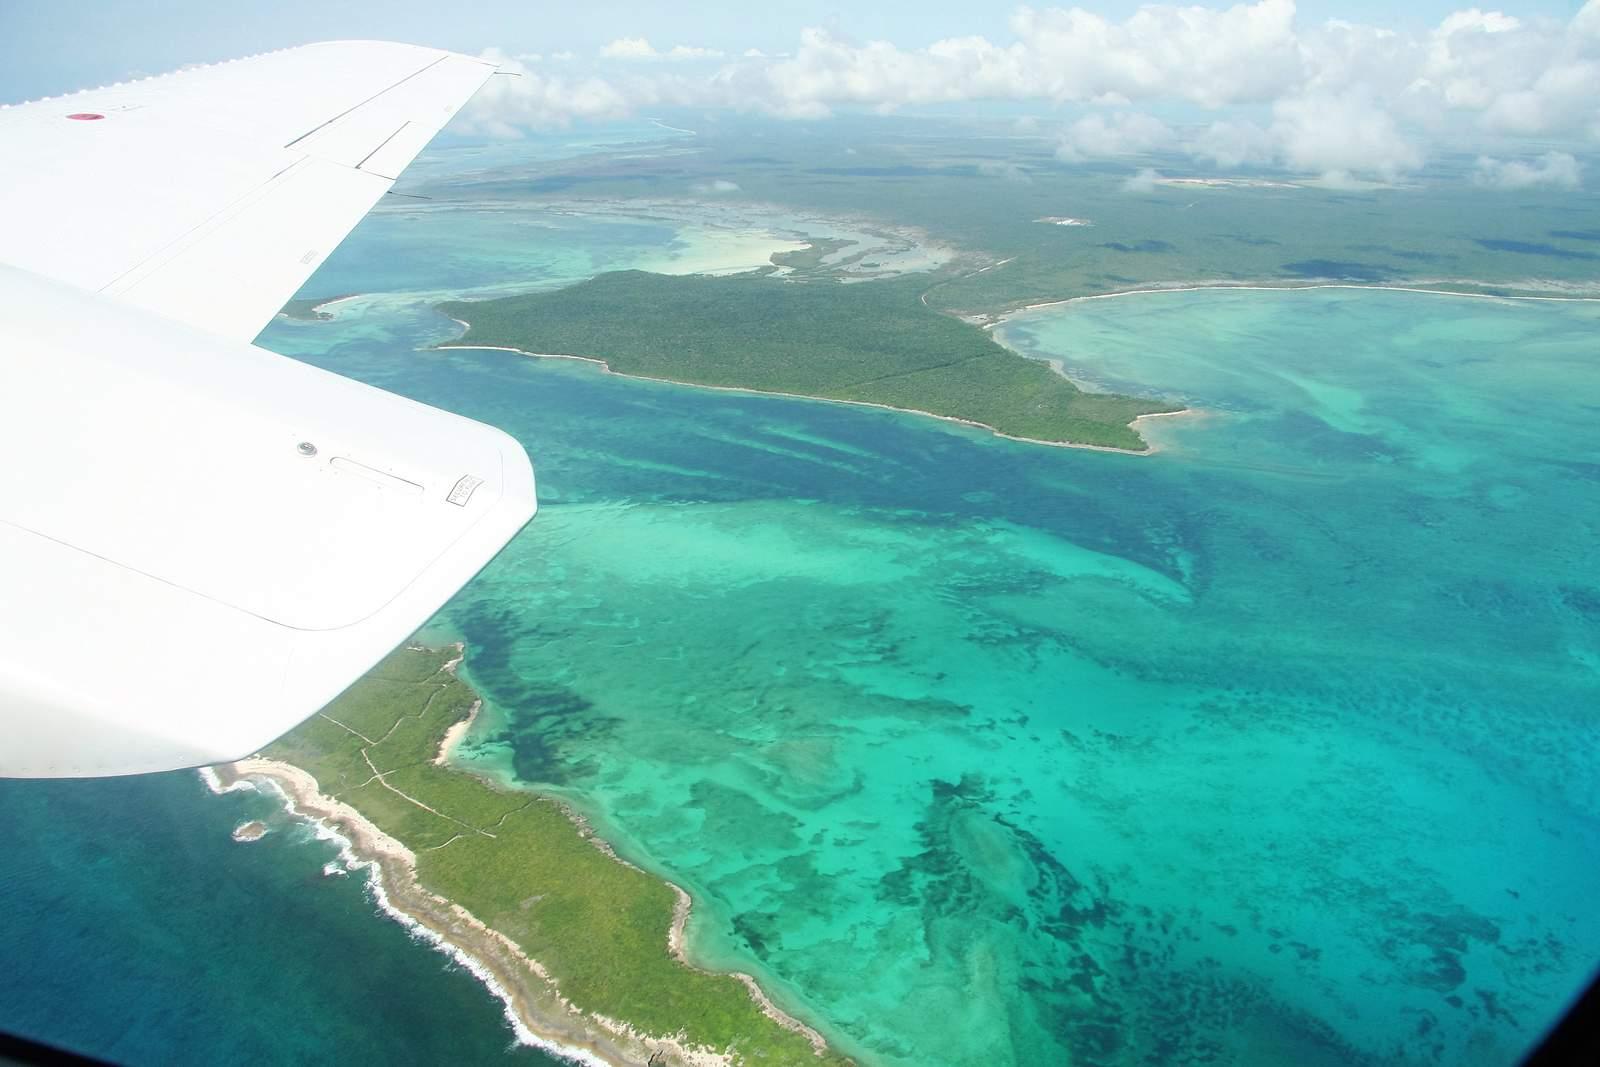 Rundflug über die Inseln, Bahamas